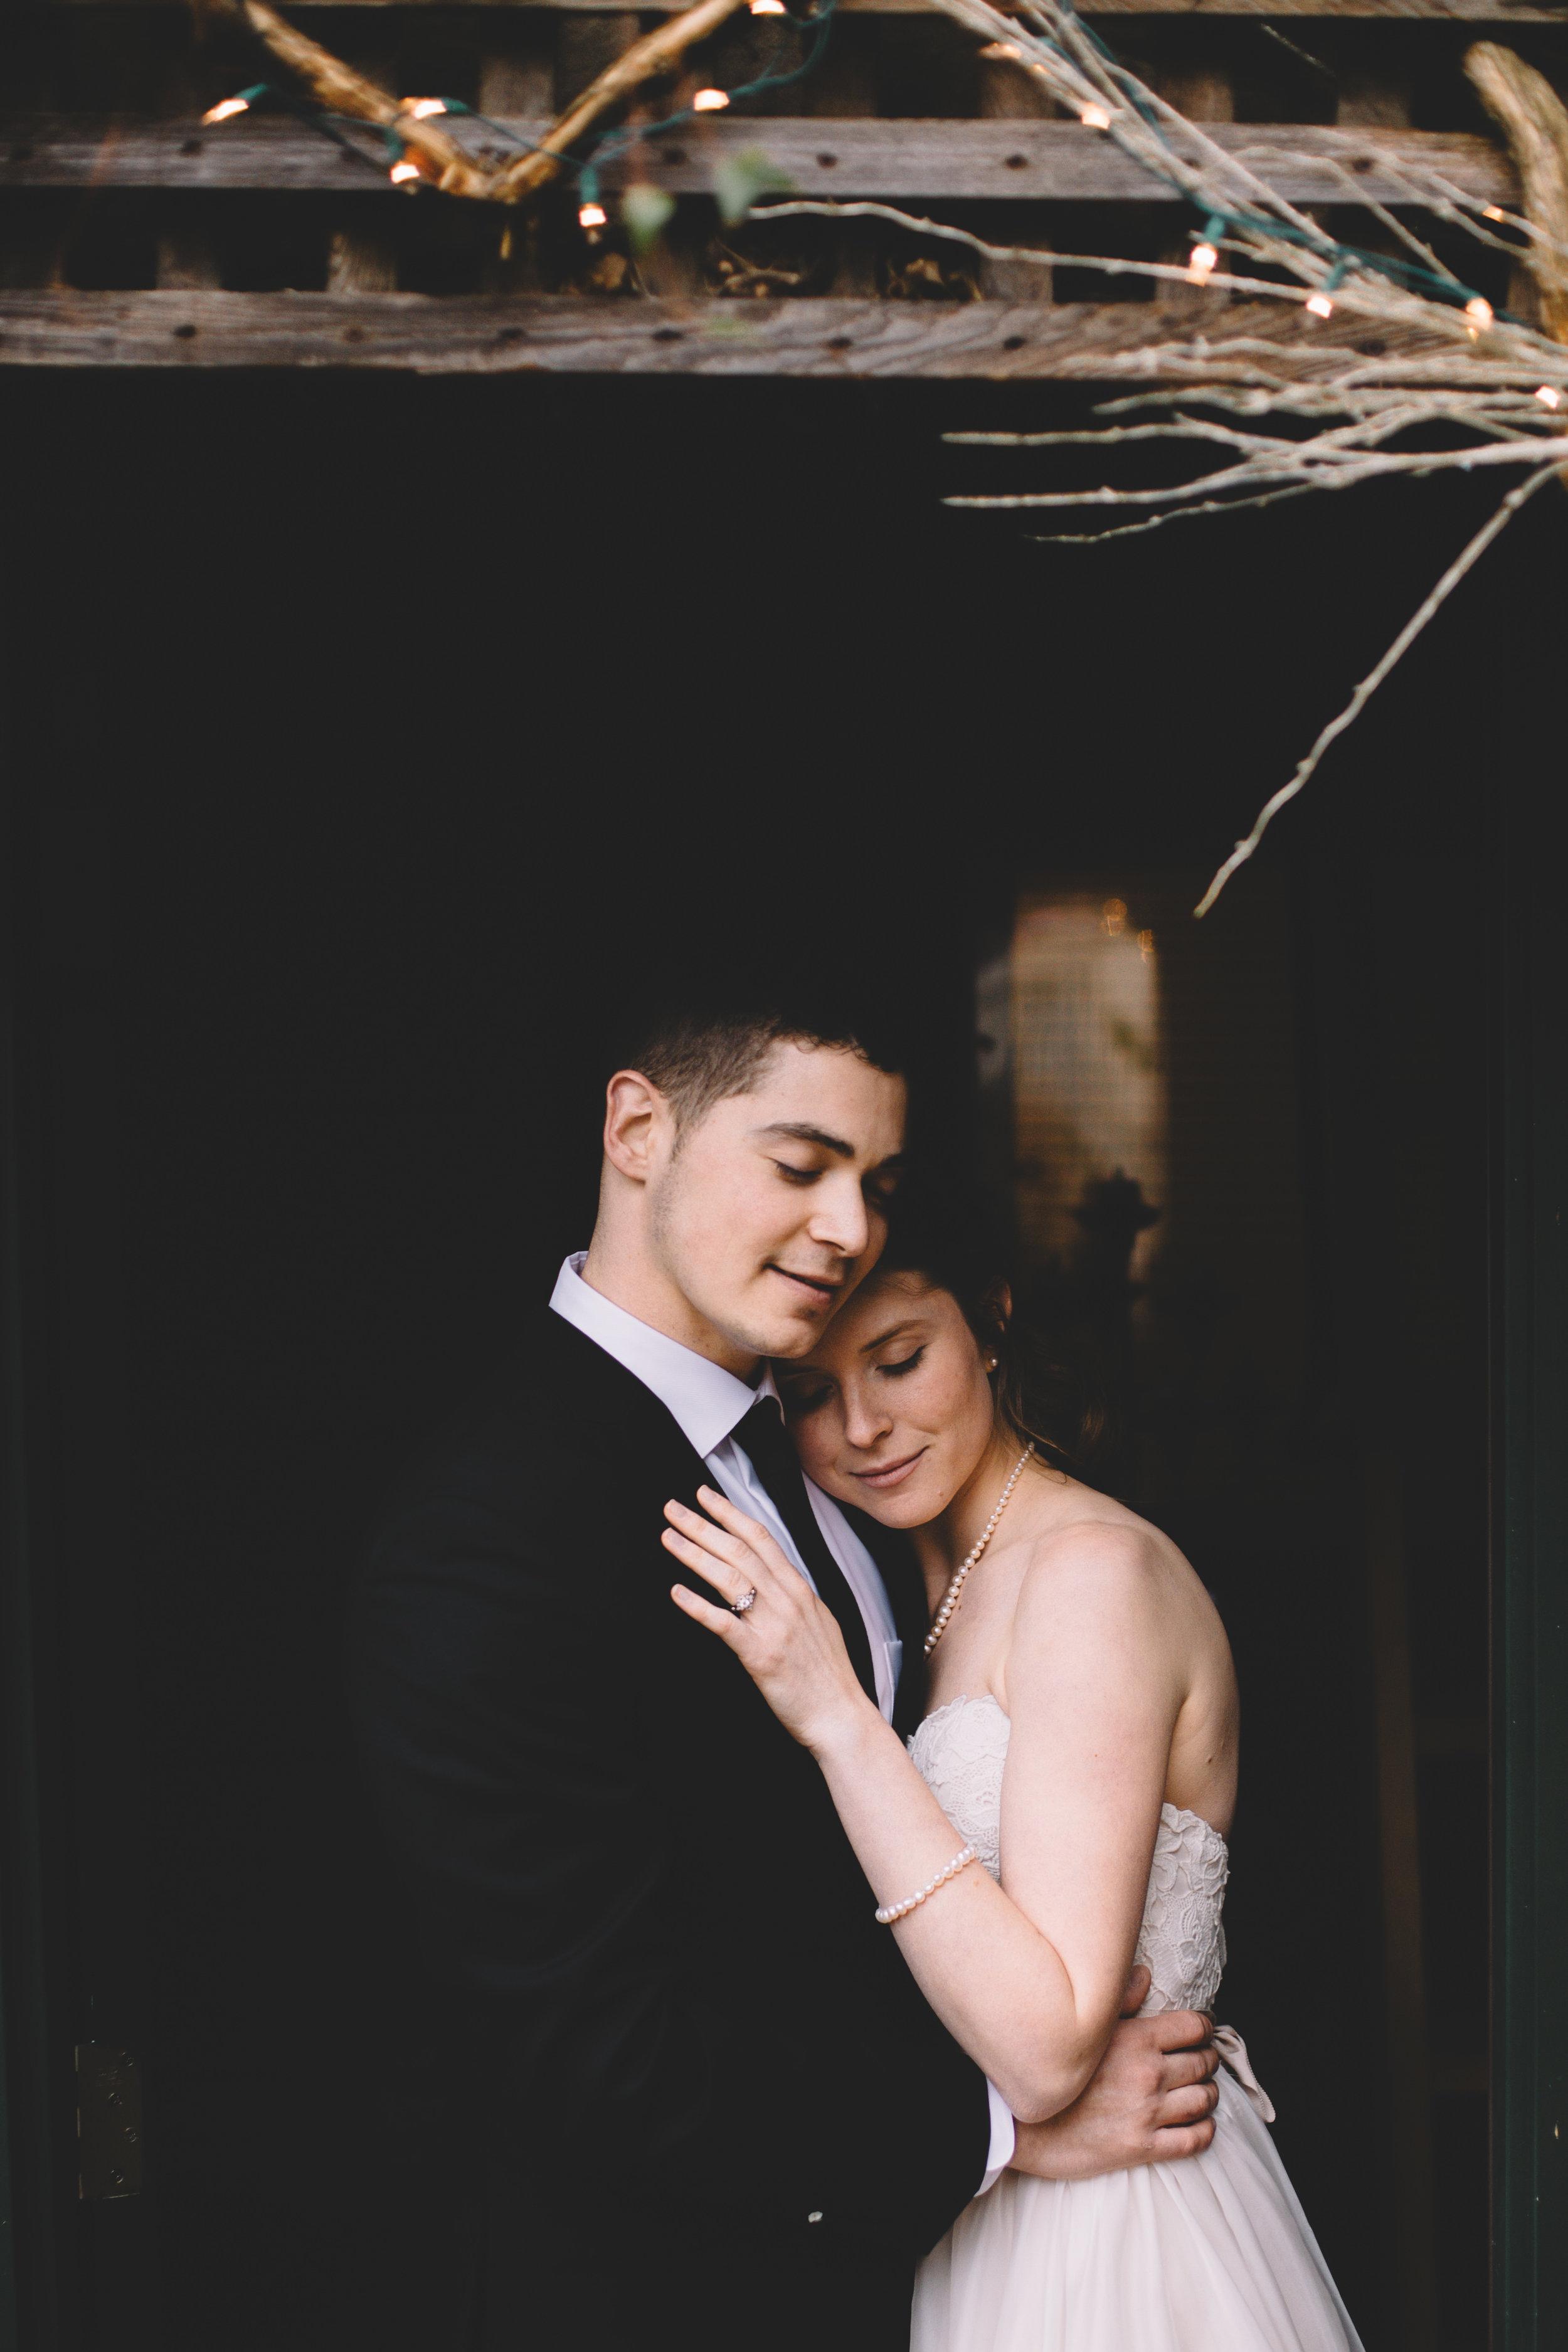 Jake + Brittney Balbas Airbnb Carriage House Wedding Evansville IN (108 of 426).jpg